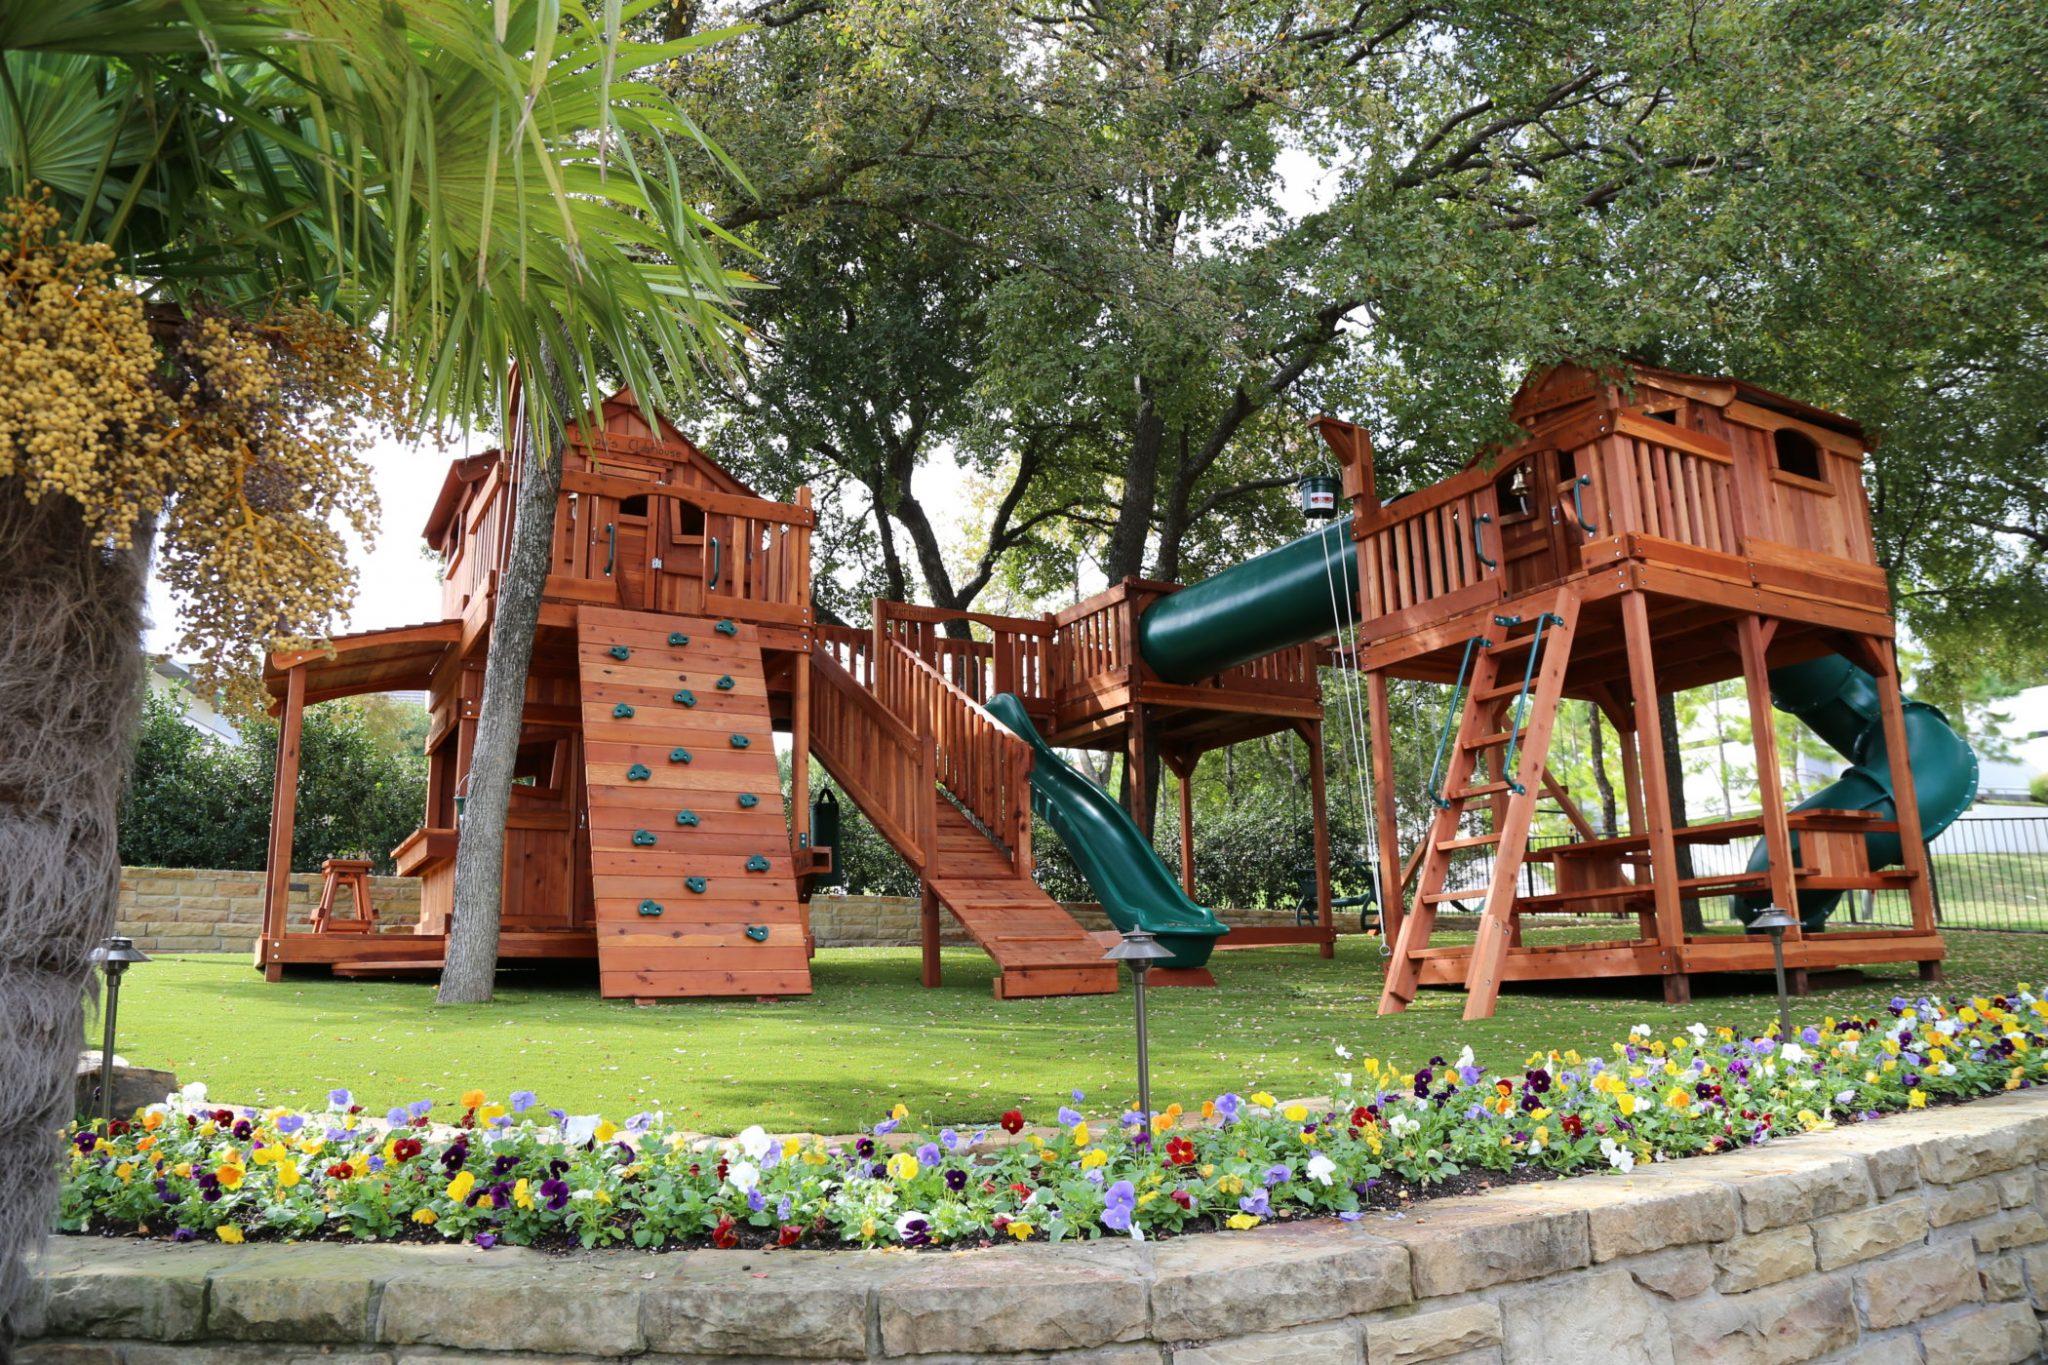 custom bridged playset, custom bridged swing set, custom wooden playset, backyard wooden swing set